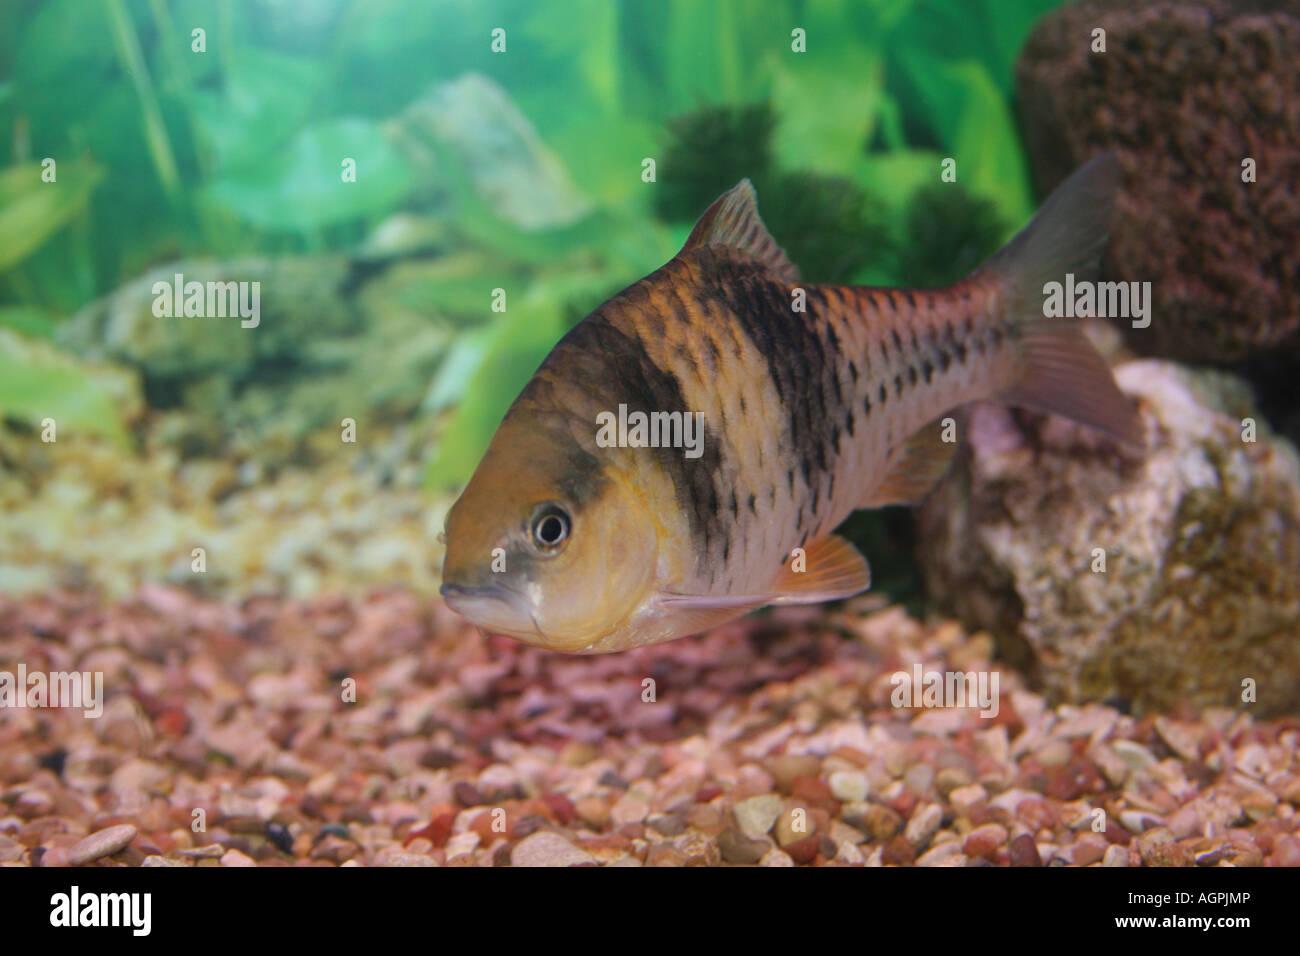 Spanner barb fish. - Stock Image